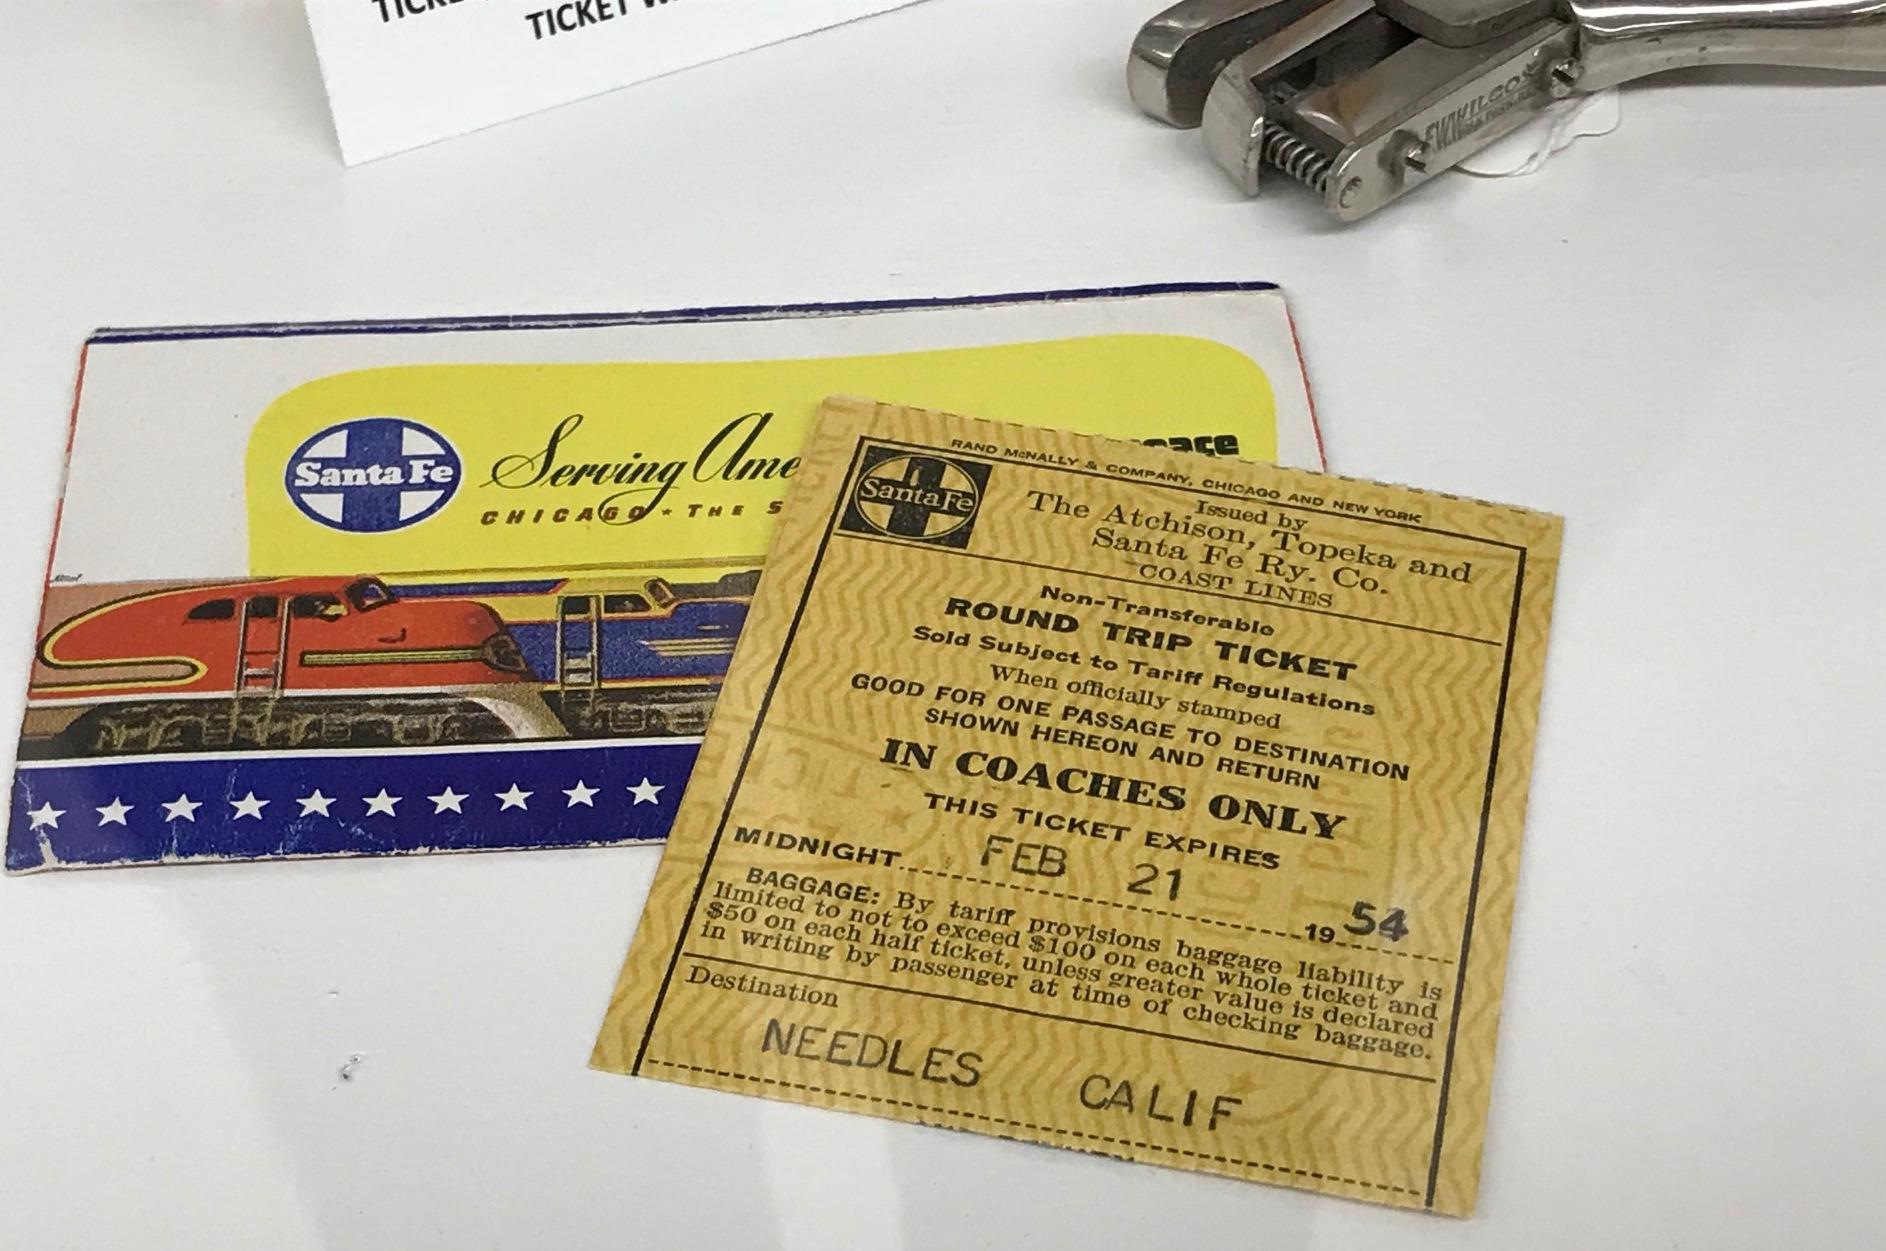 The museum was primarily old railroad memorabilia.